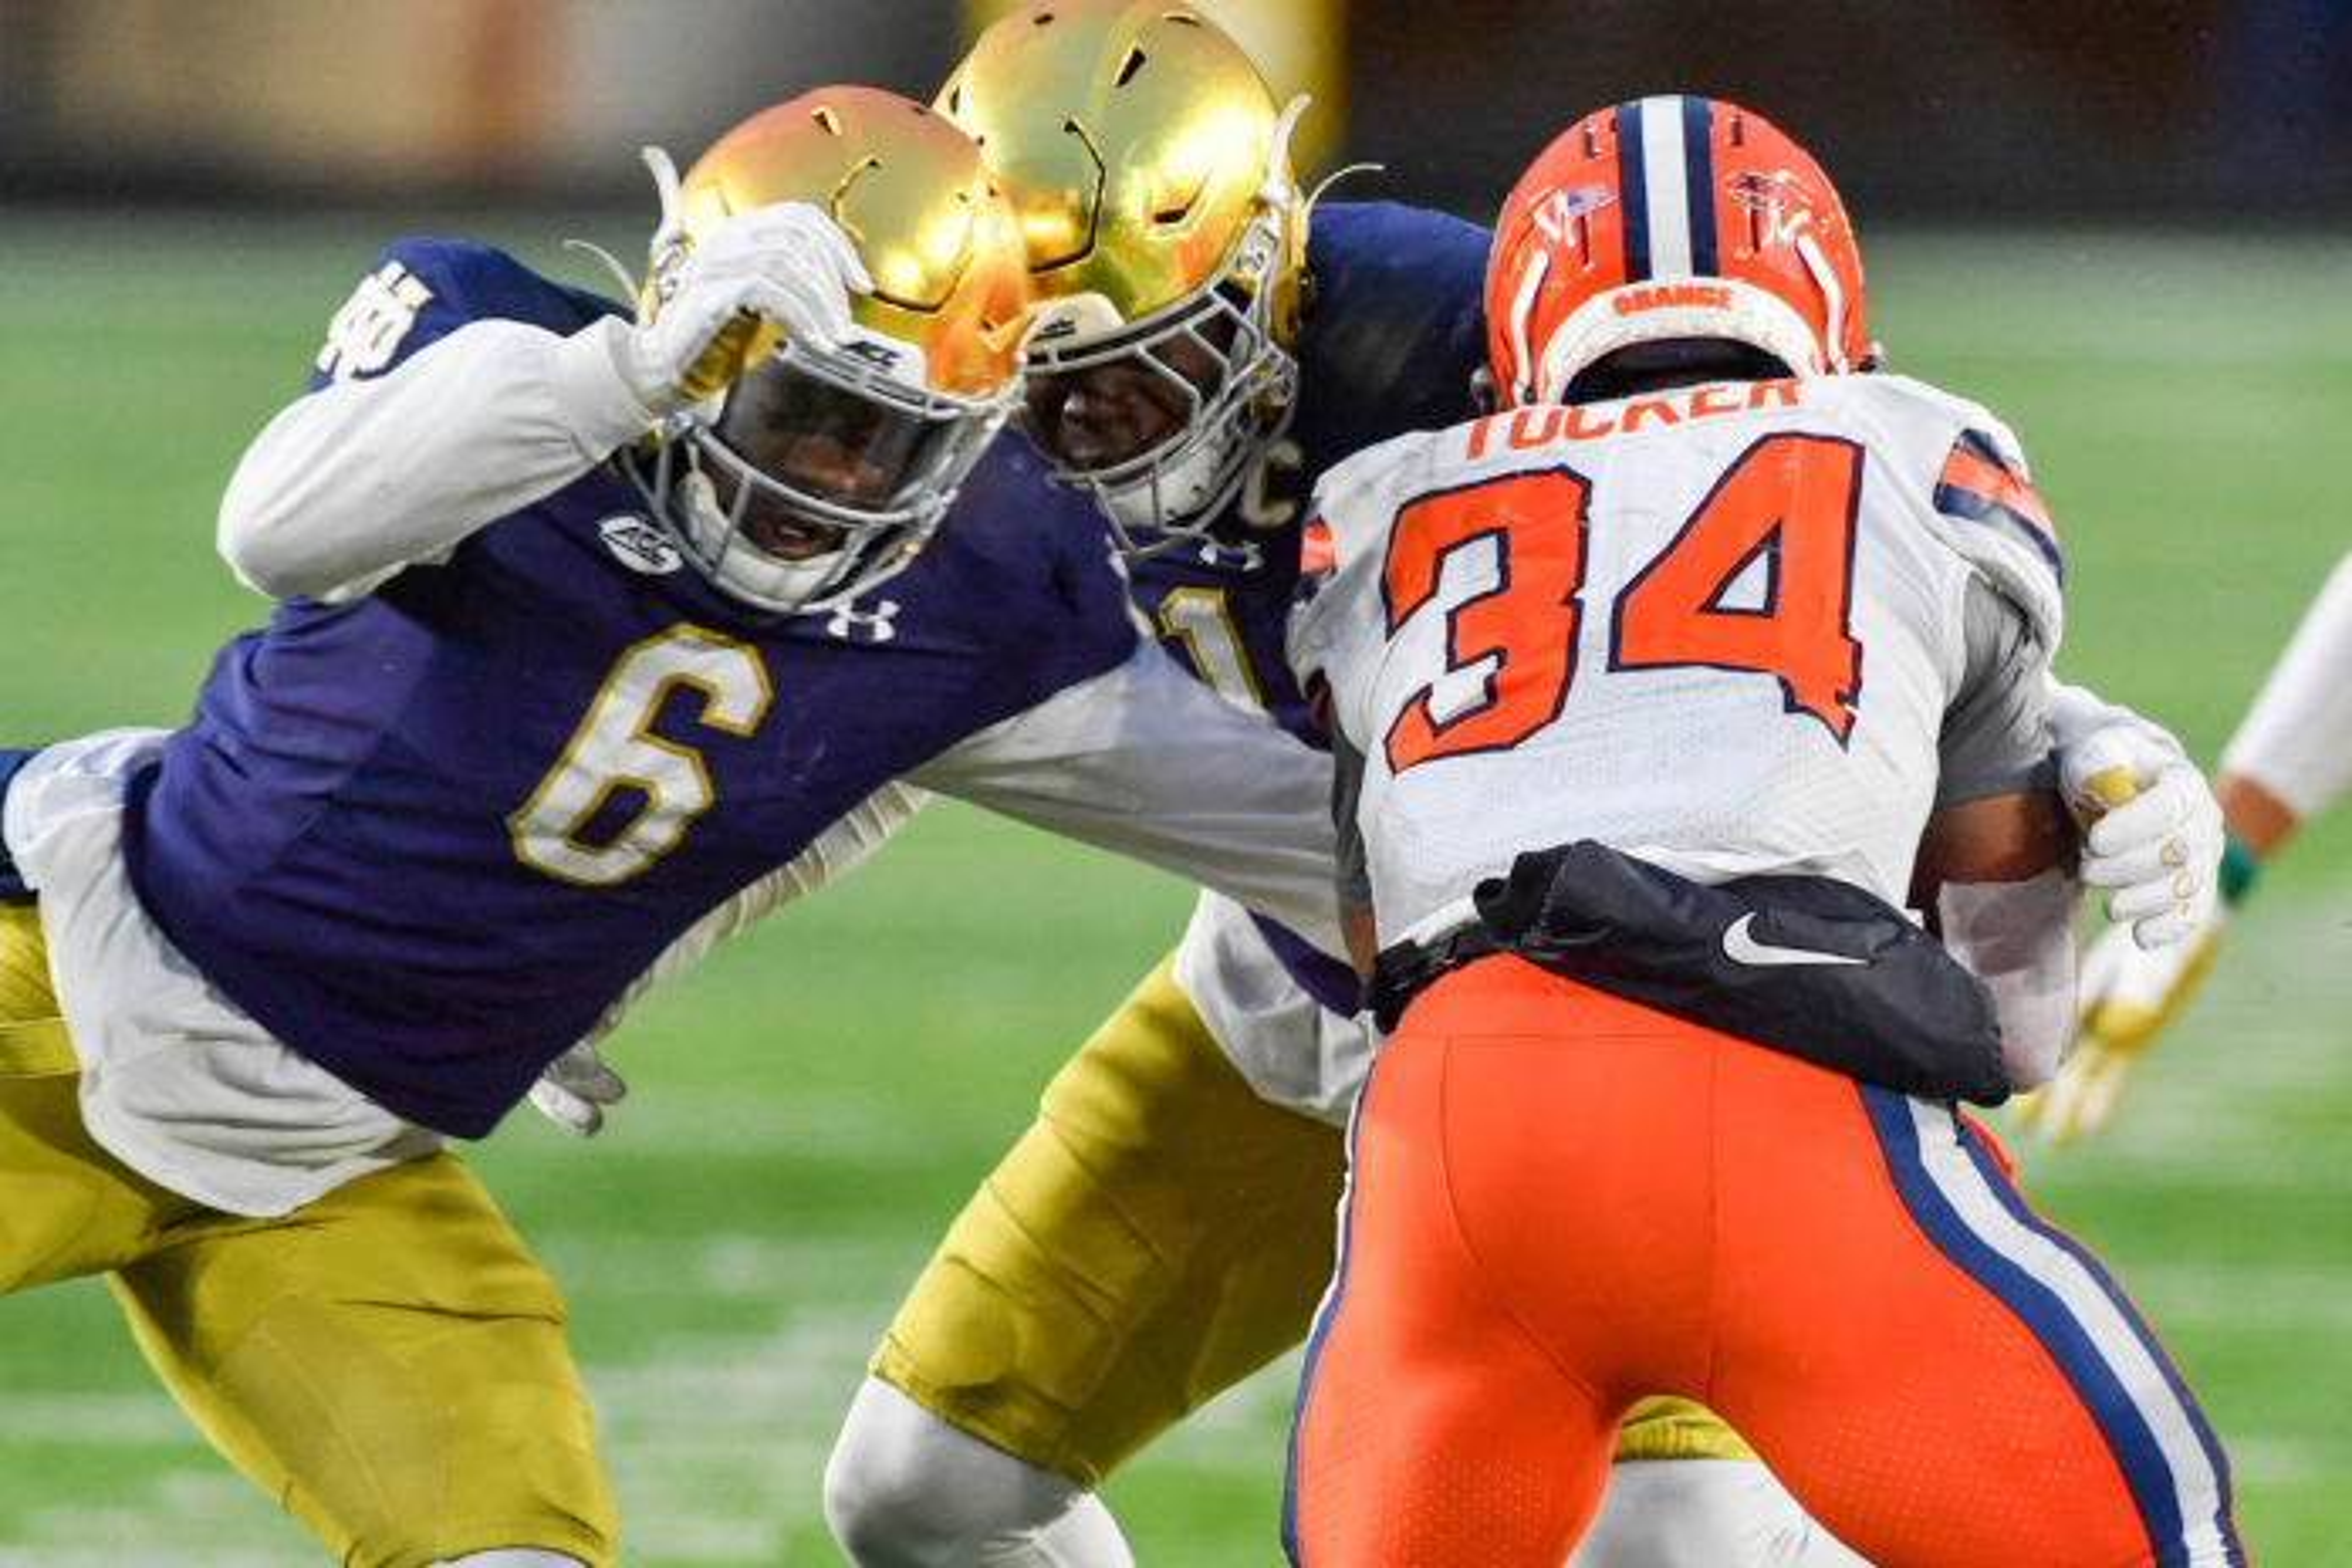 Syracuse Orange running back Sean Tucker (34) is tackled by Notre Dame Fighting Irish linebacker Jeremiah Owusu-Koramoah (6) in the third quarter at Notre Dame Stadium.